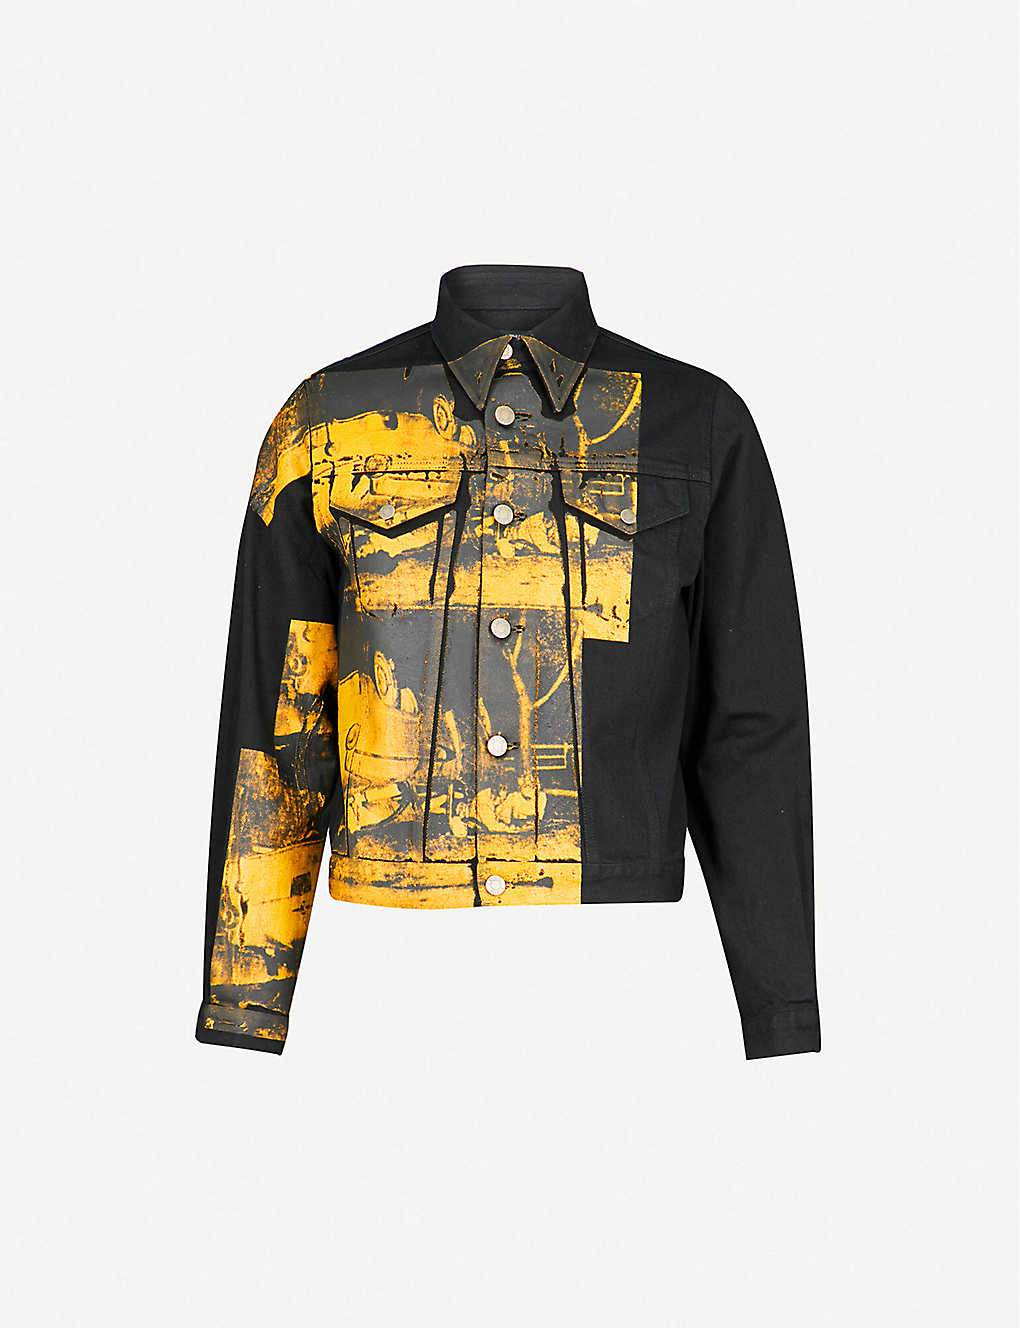 051335c76 CALVIN KLEIN 205W39NYC - Andy Warhol print denim jacket | Selfridges.com